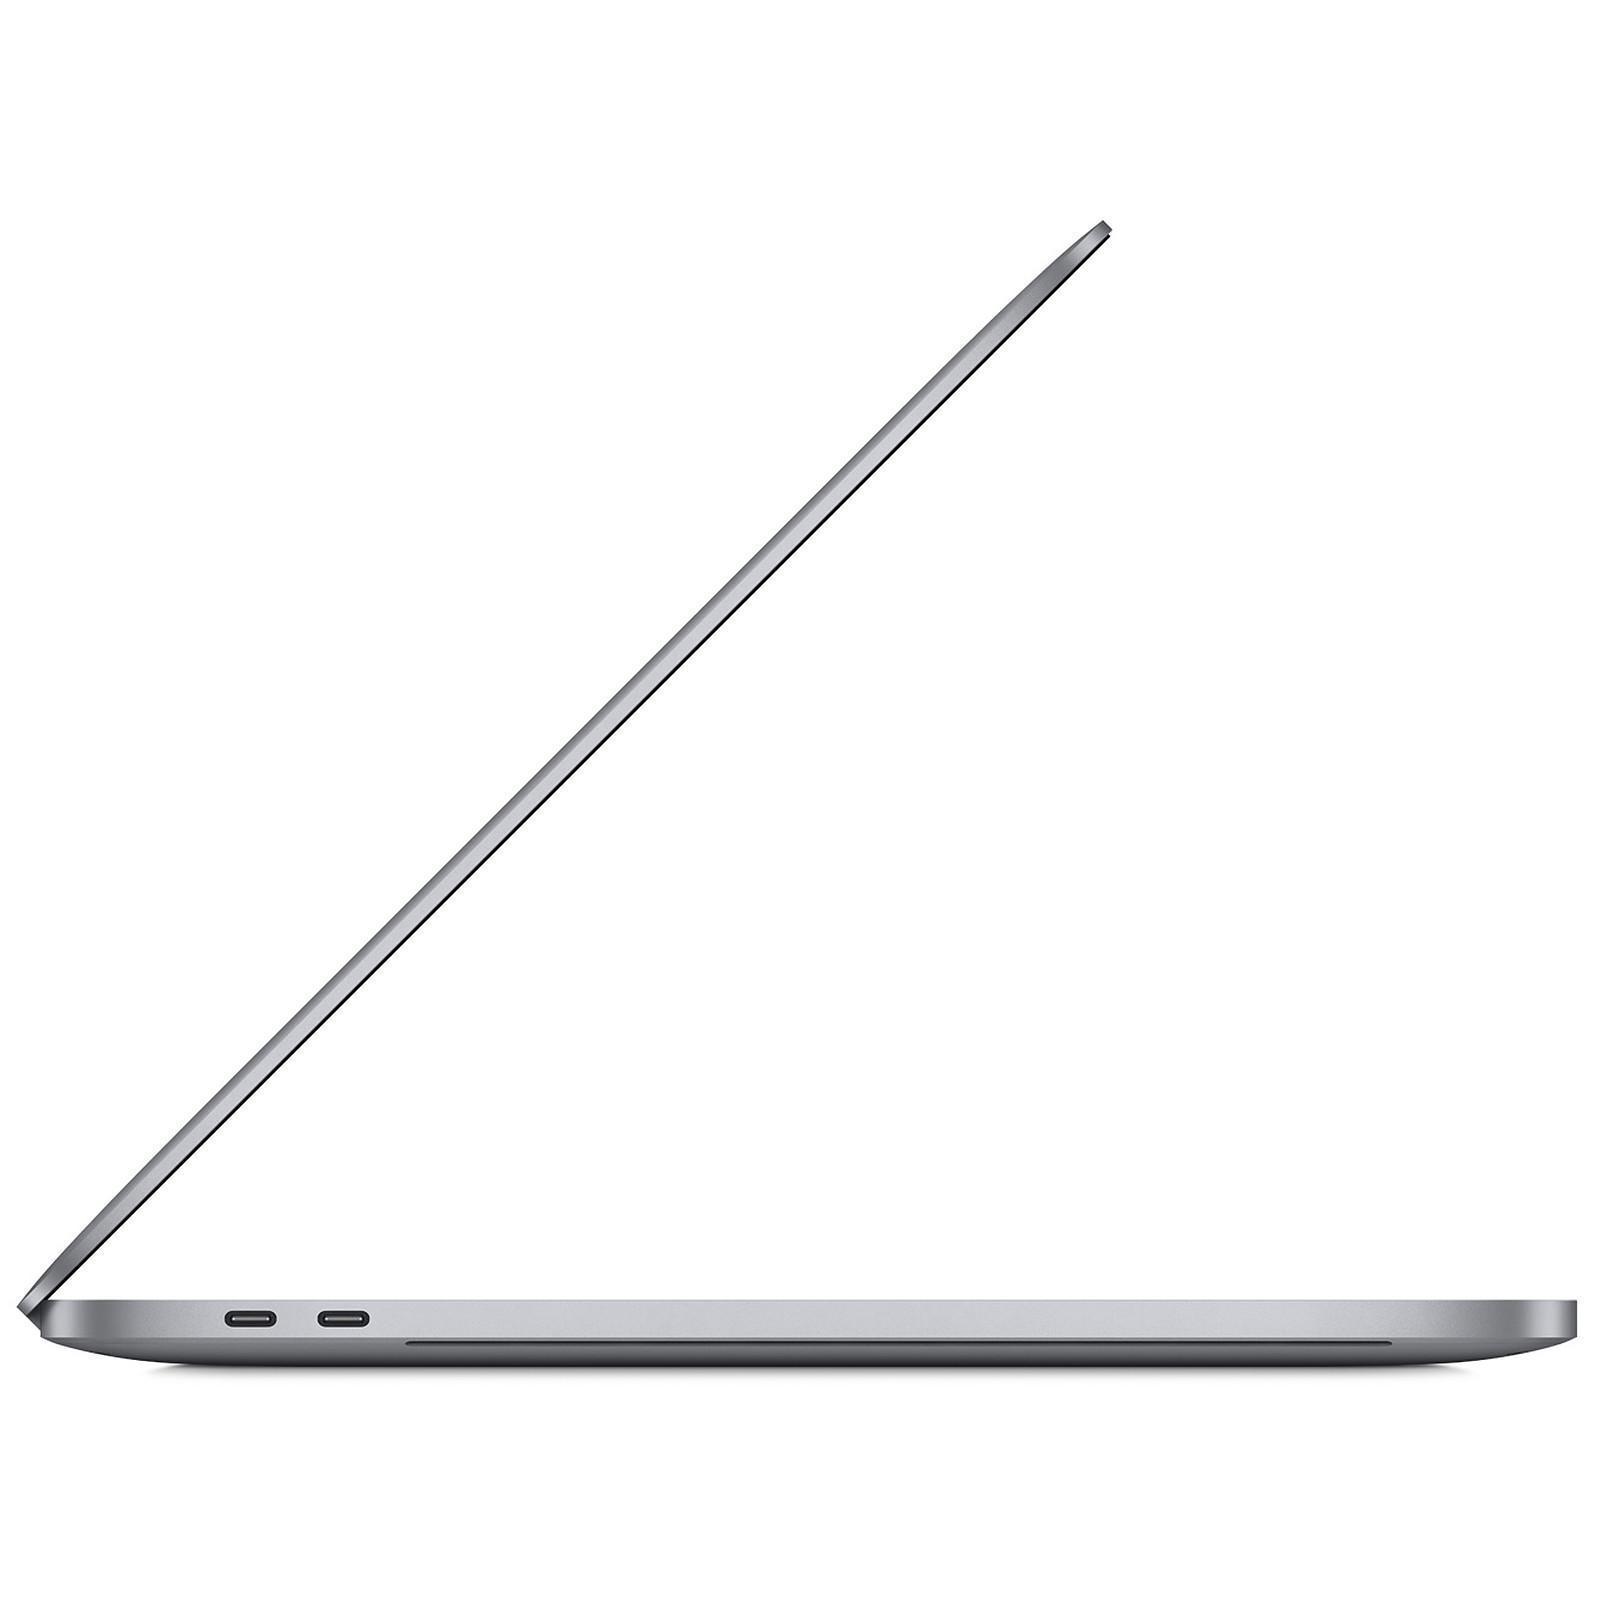 MacBook Pro Retina 16-inch (2019) - Core i7 - 16GB - SSD 512 GB